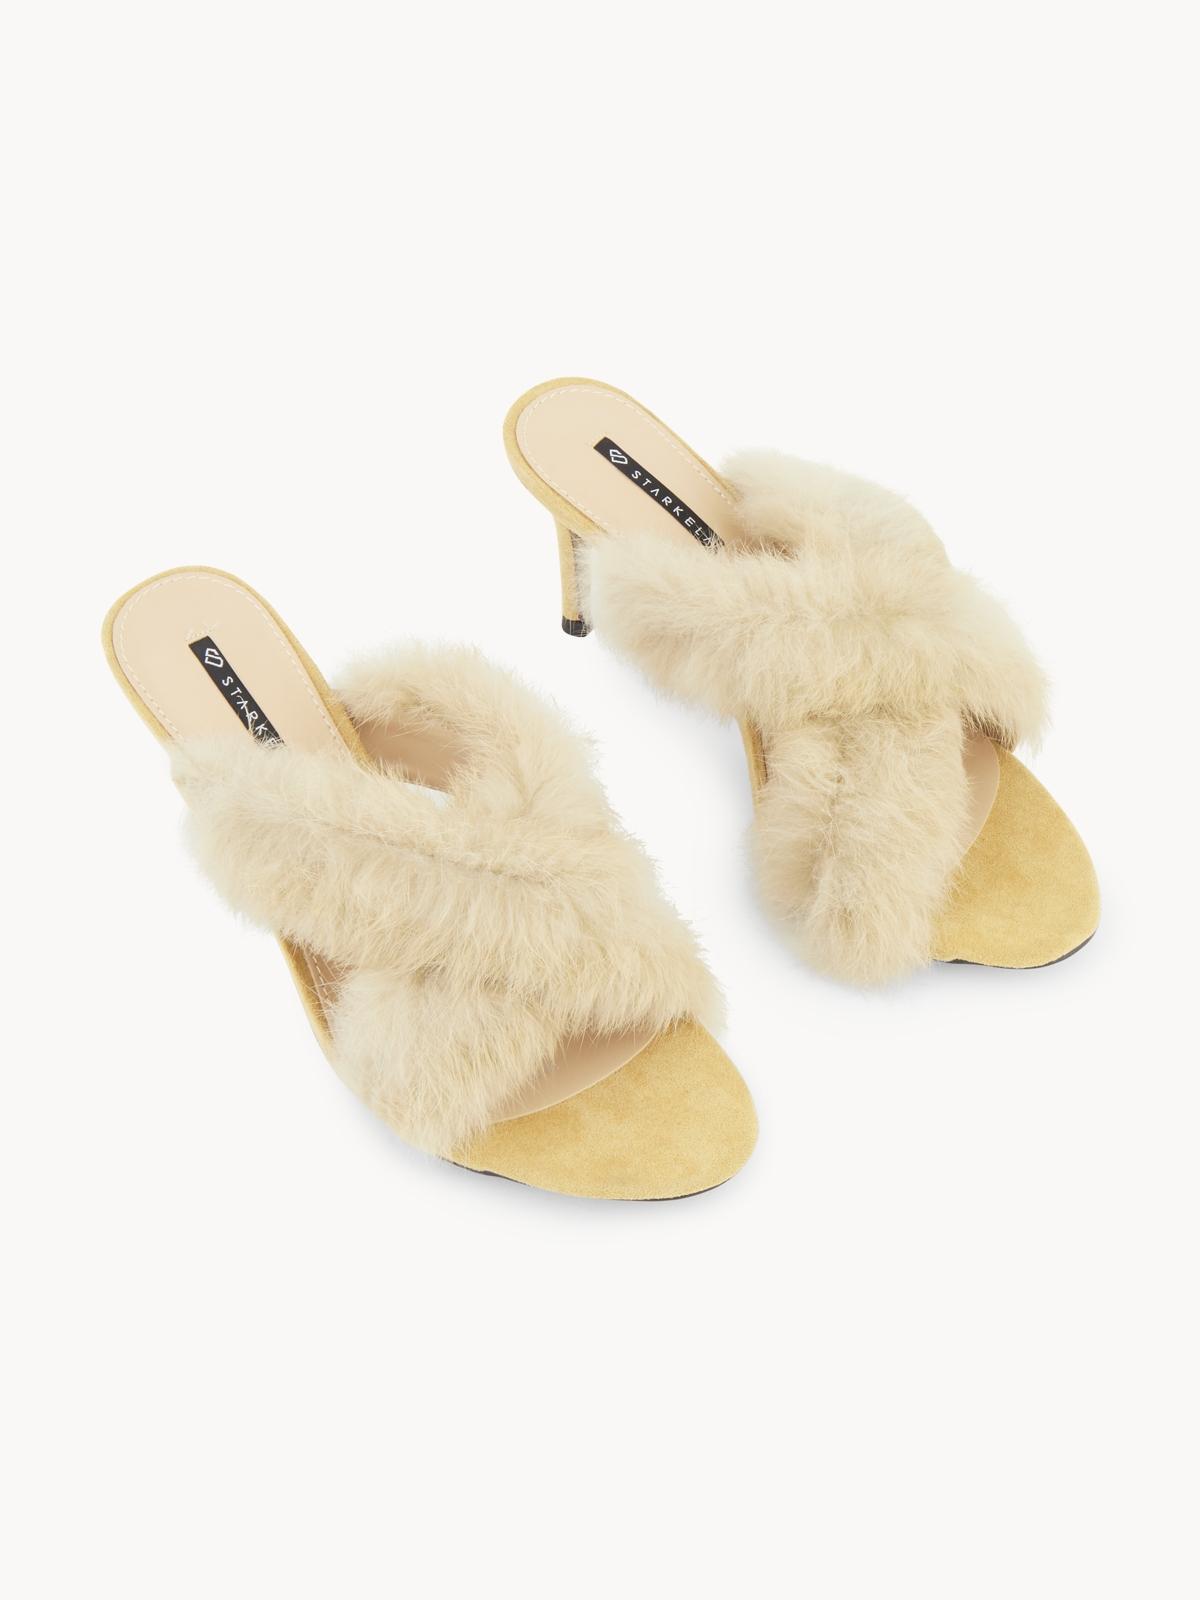 Starkela Furry Sandal Heels Beige